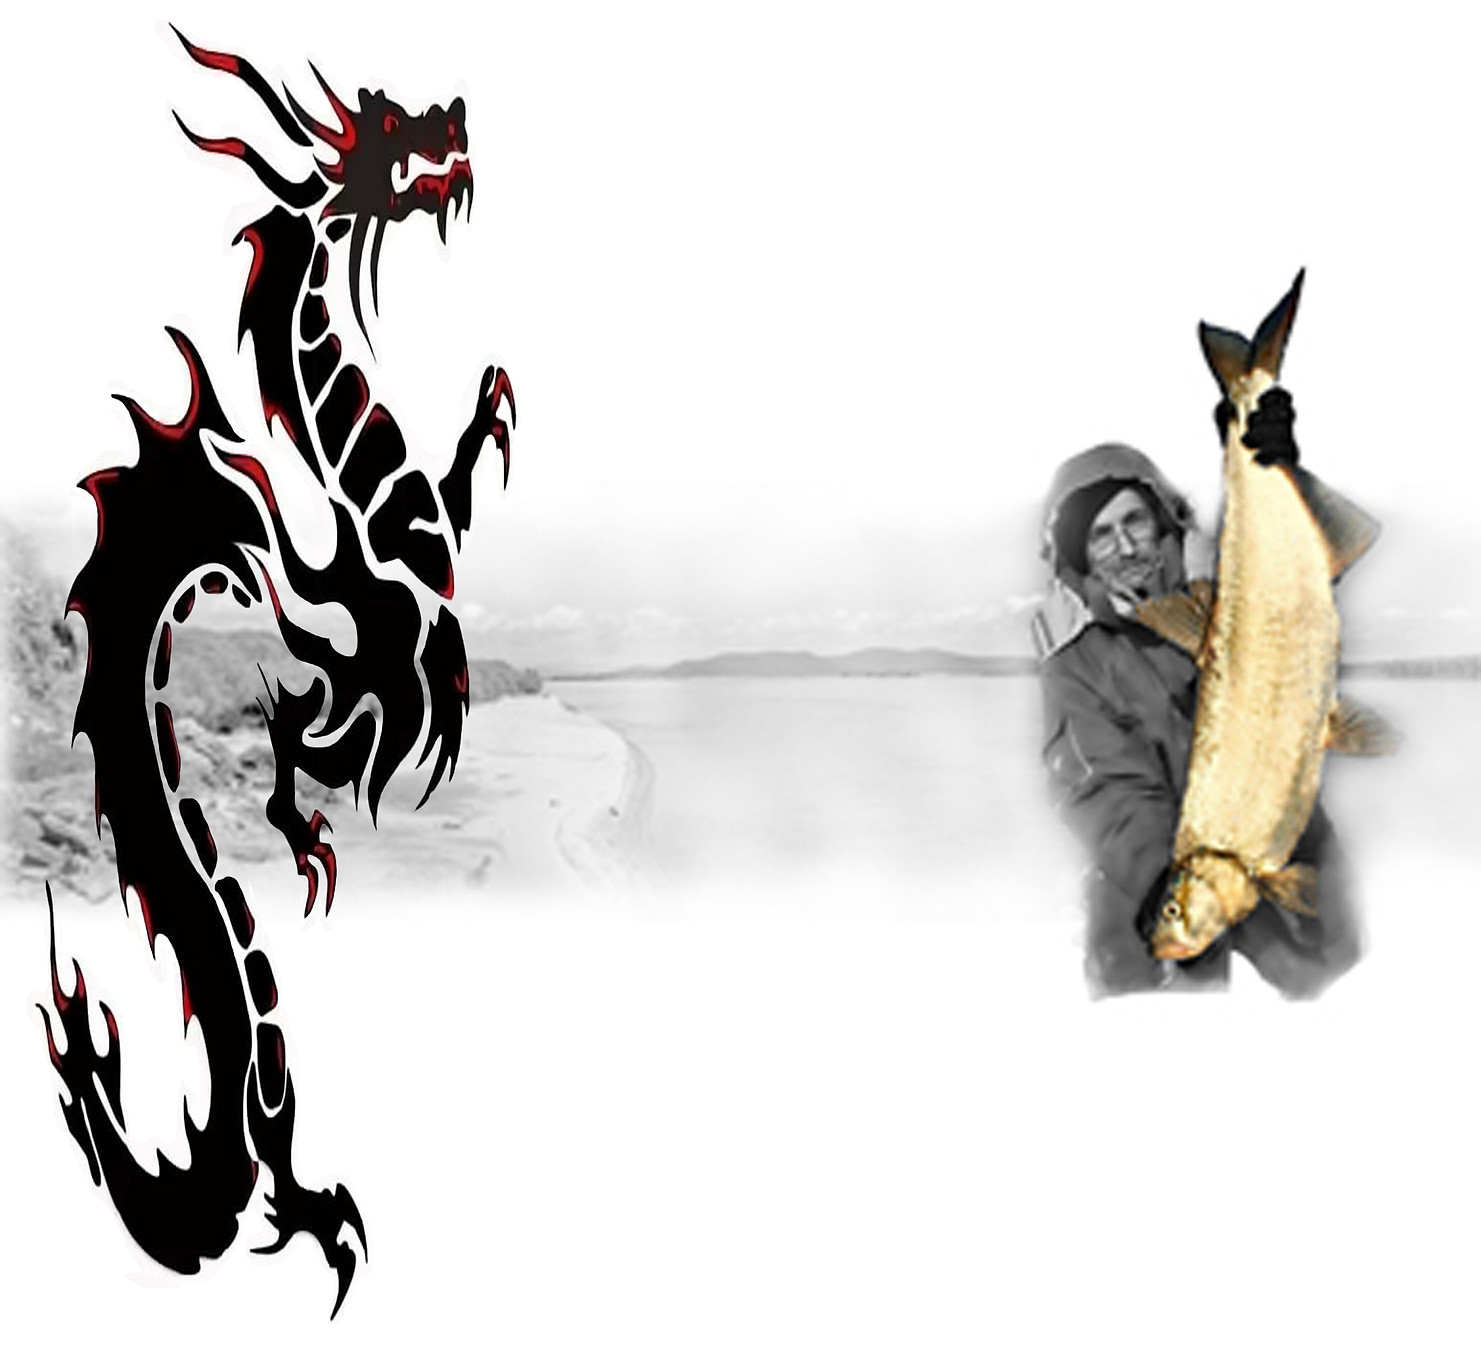 дракон китайскый.jpg